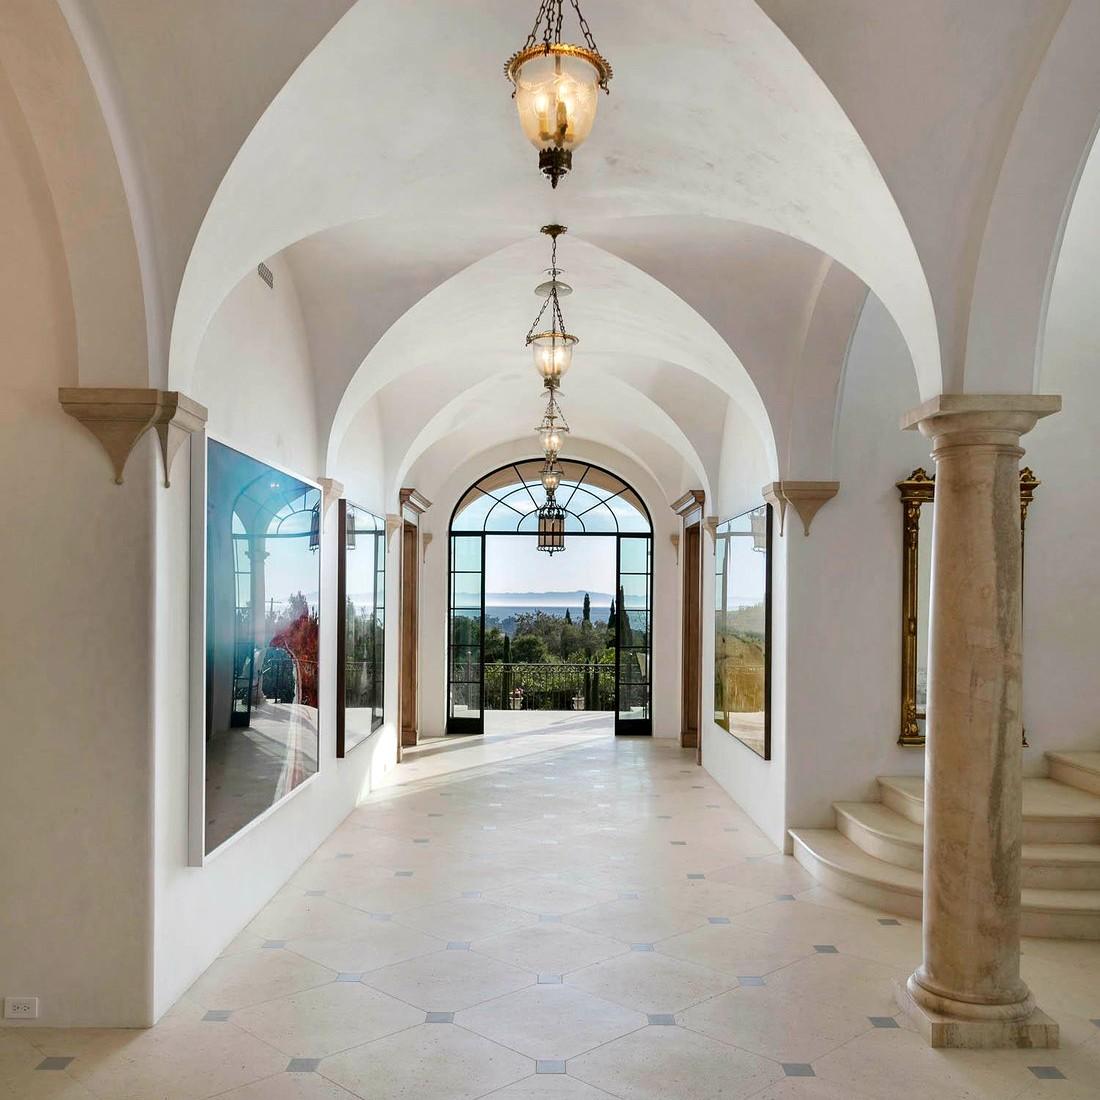 Santa Barbara style architecture: Antique salvage, Millwork, Art design and architecture museum.